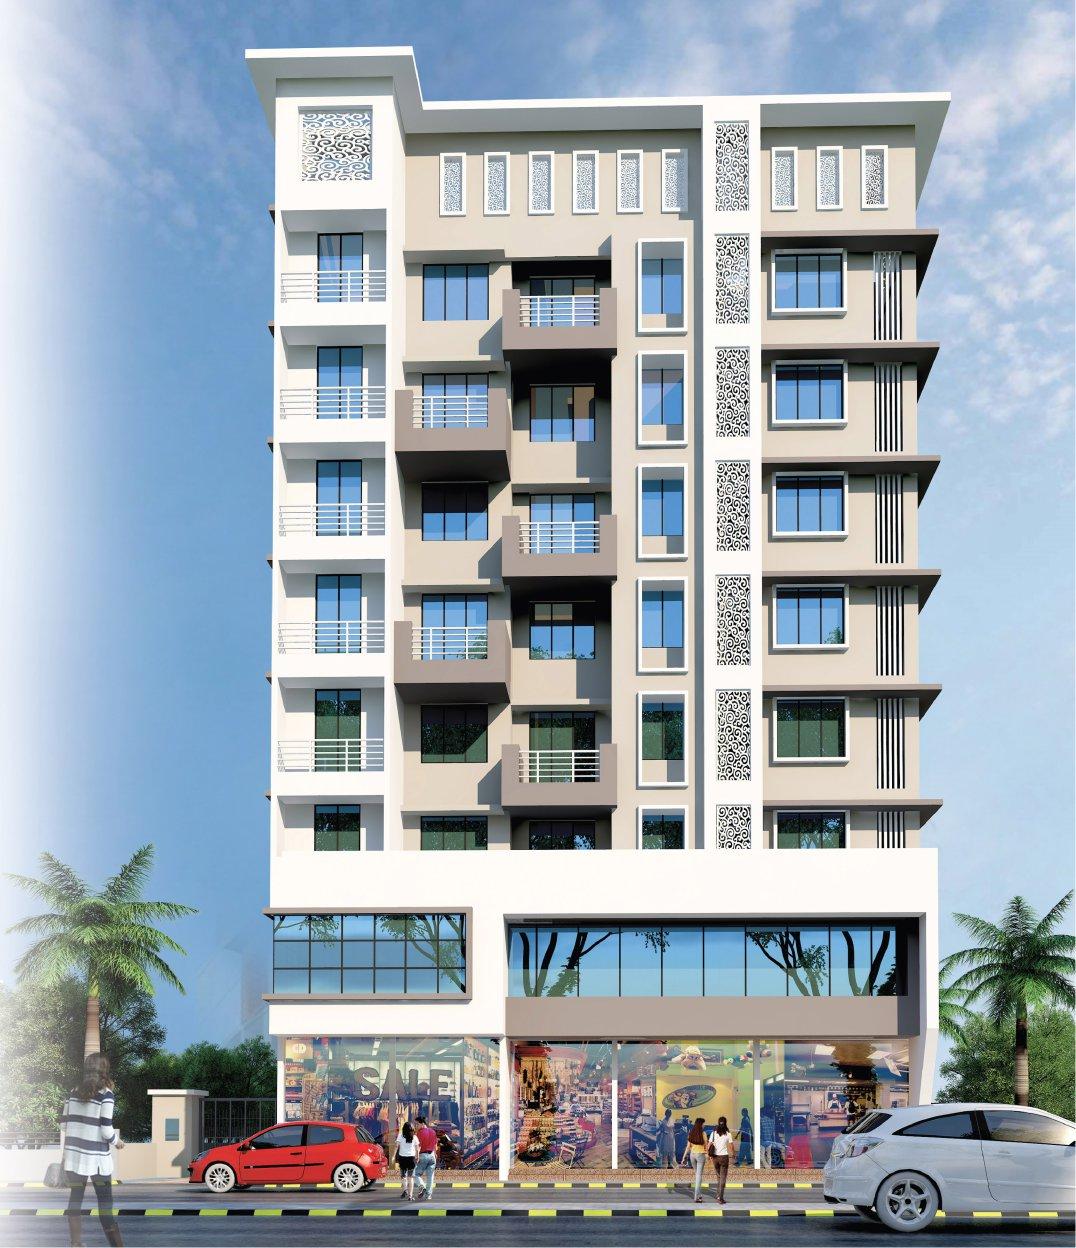 1 & 2 BHK Flats in Ambernath East Mumbai in Soham Prakruti Sparsh - Sqmtrs